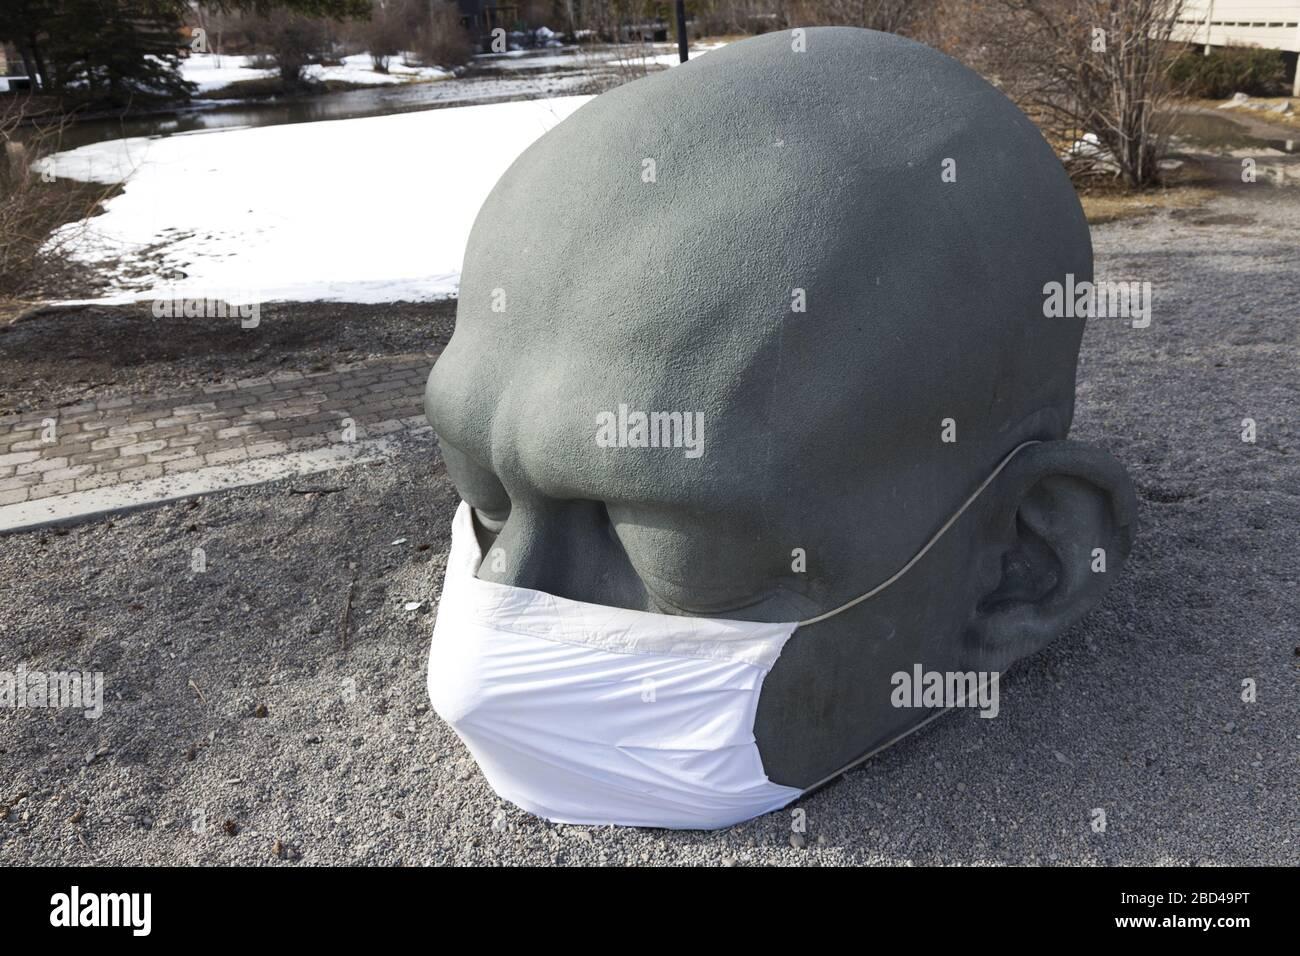 big-head-sculpture-landmark-by-artist-al